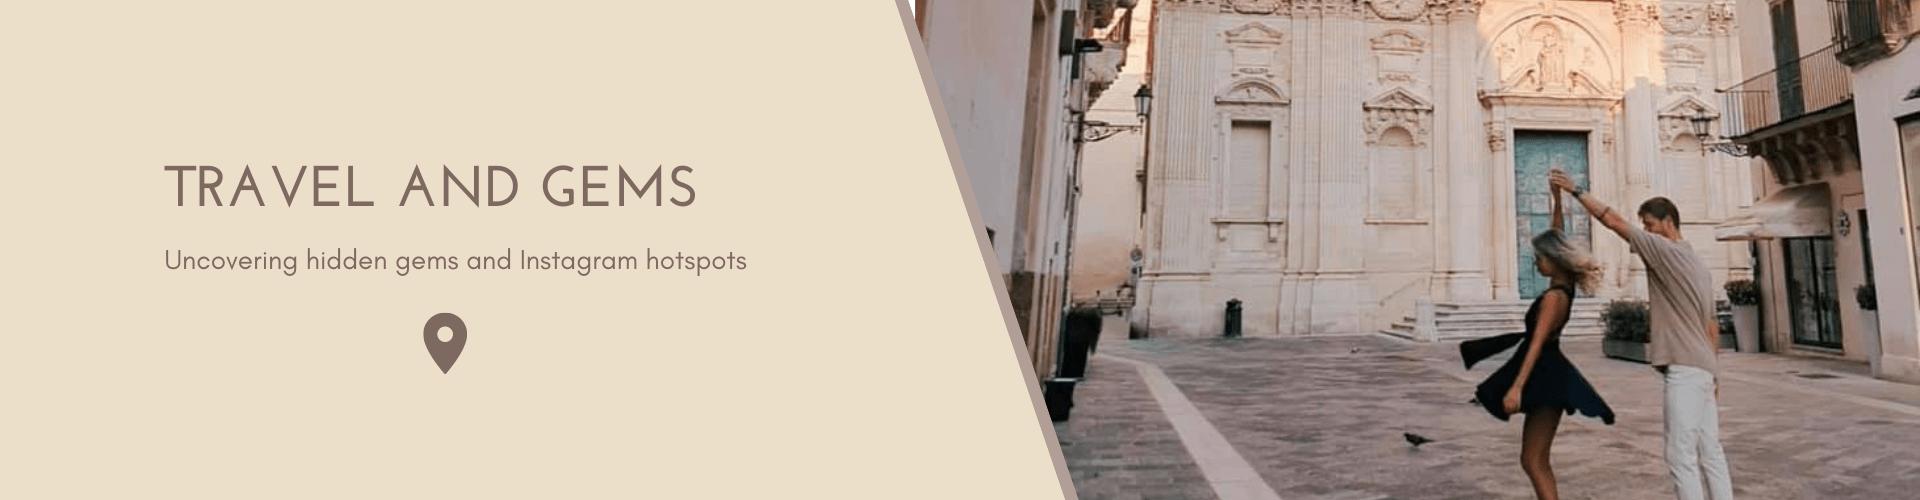 Travel and gems, unconvering hidden gems and instagram hotspots